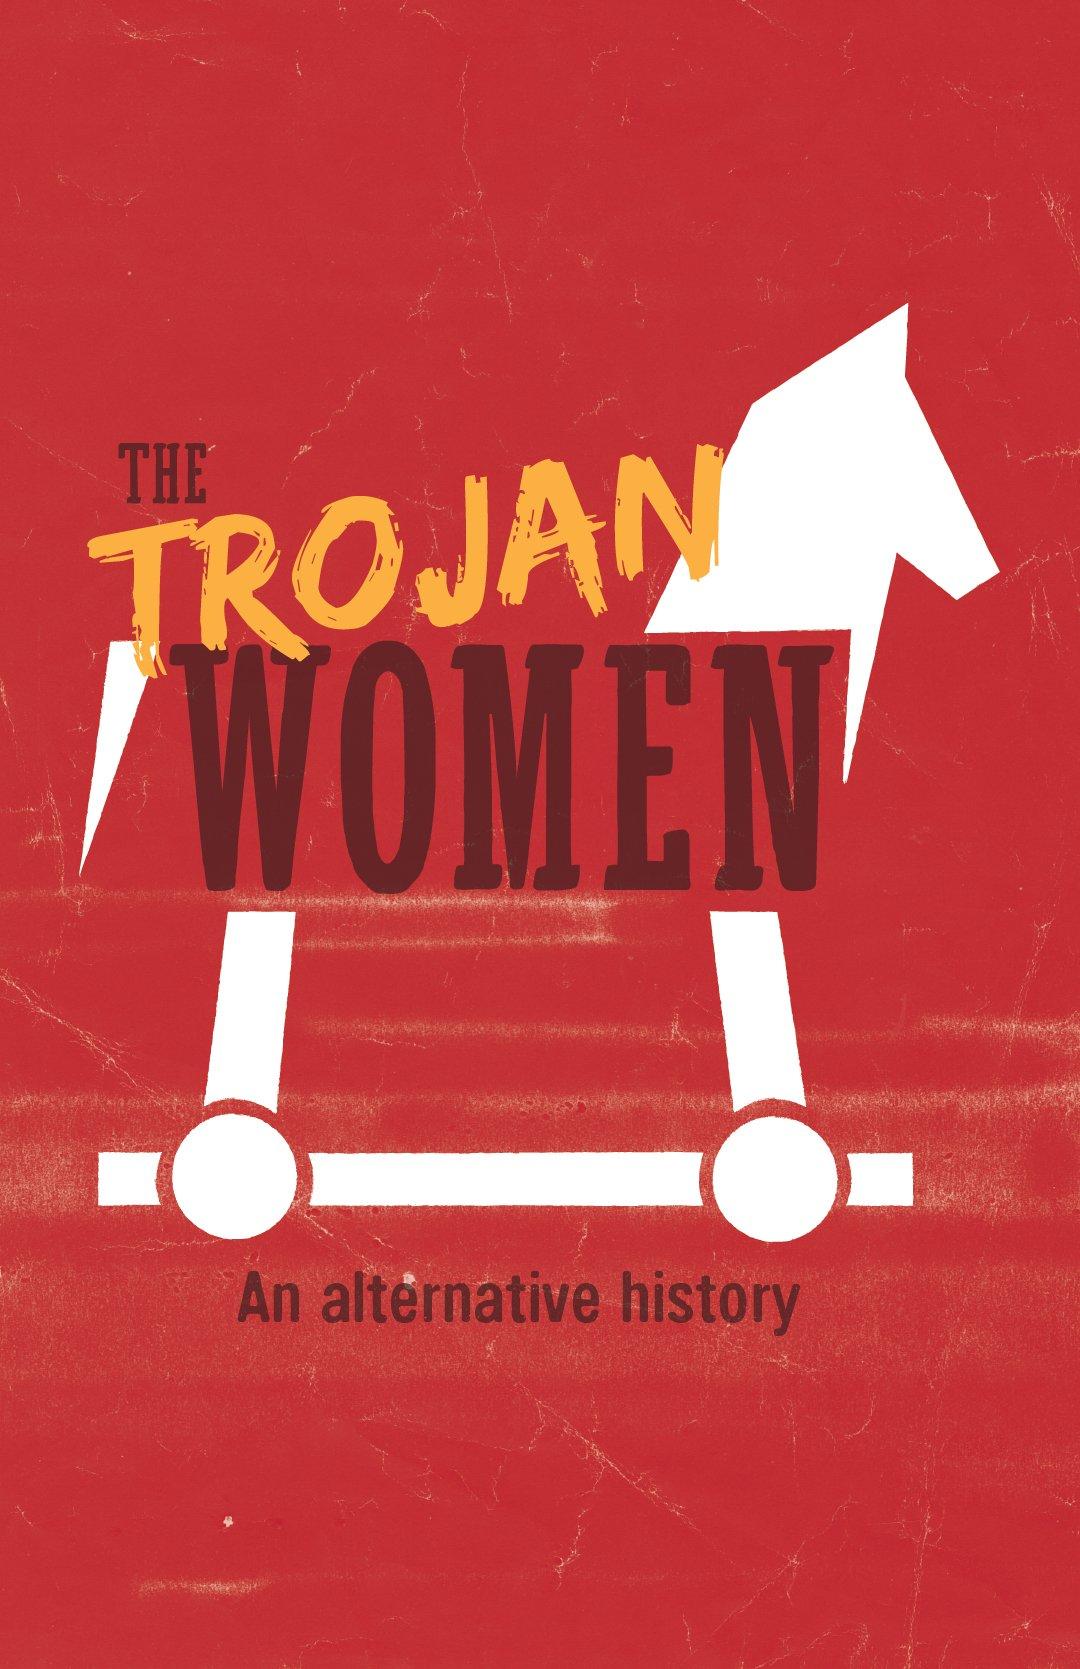 Virginia Tech School of Performing Arts show poster - The Trojan Women